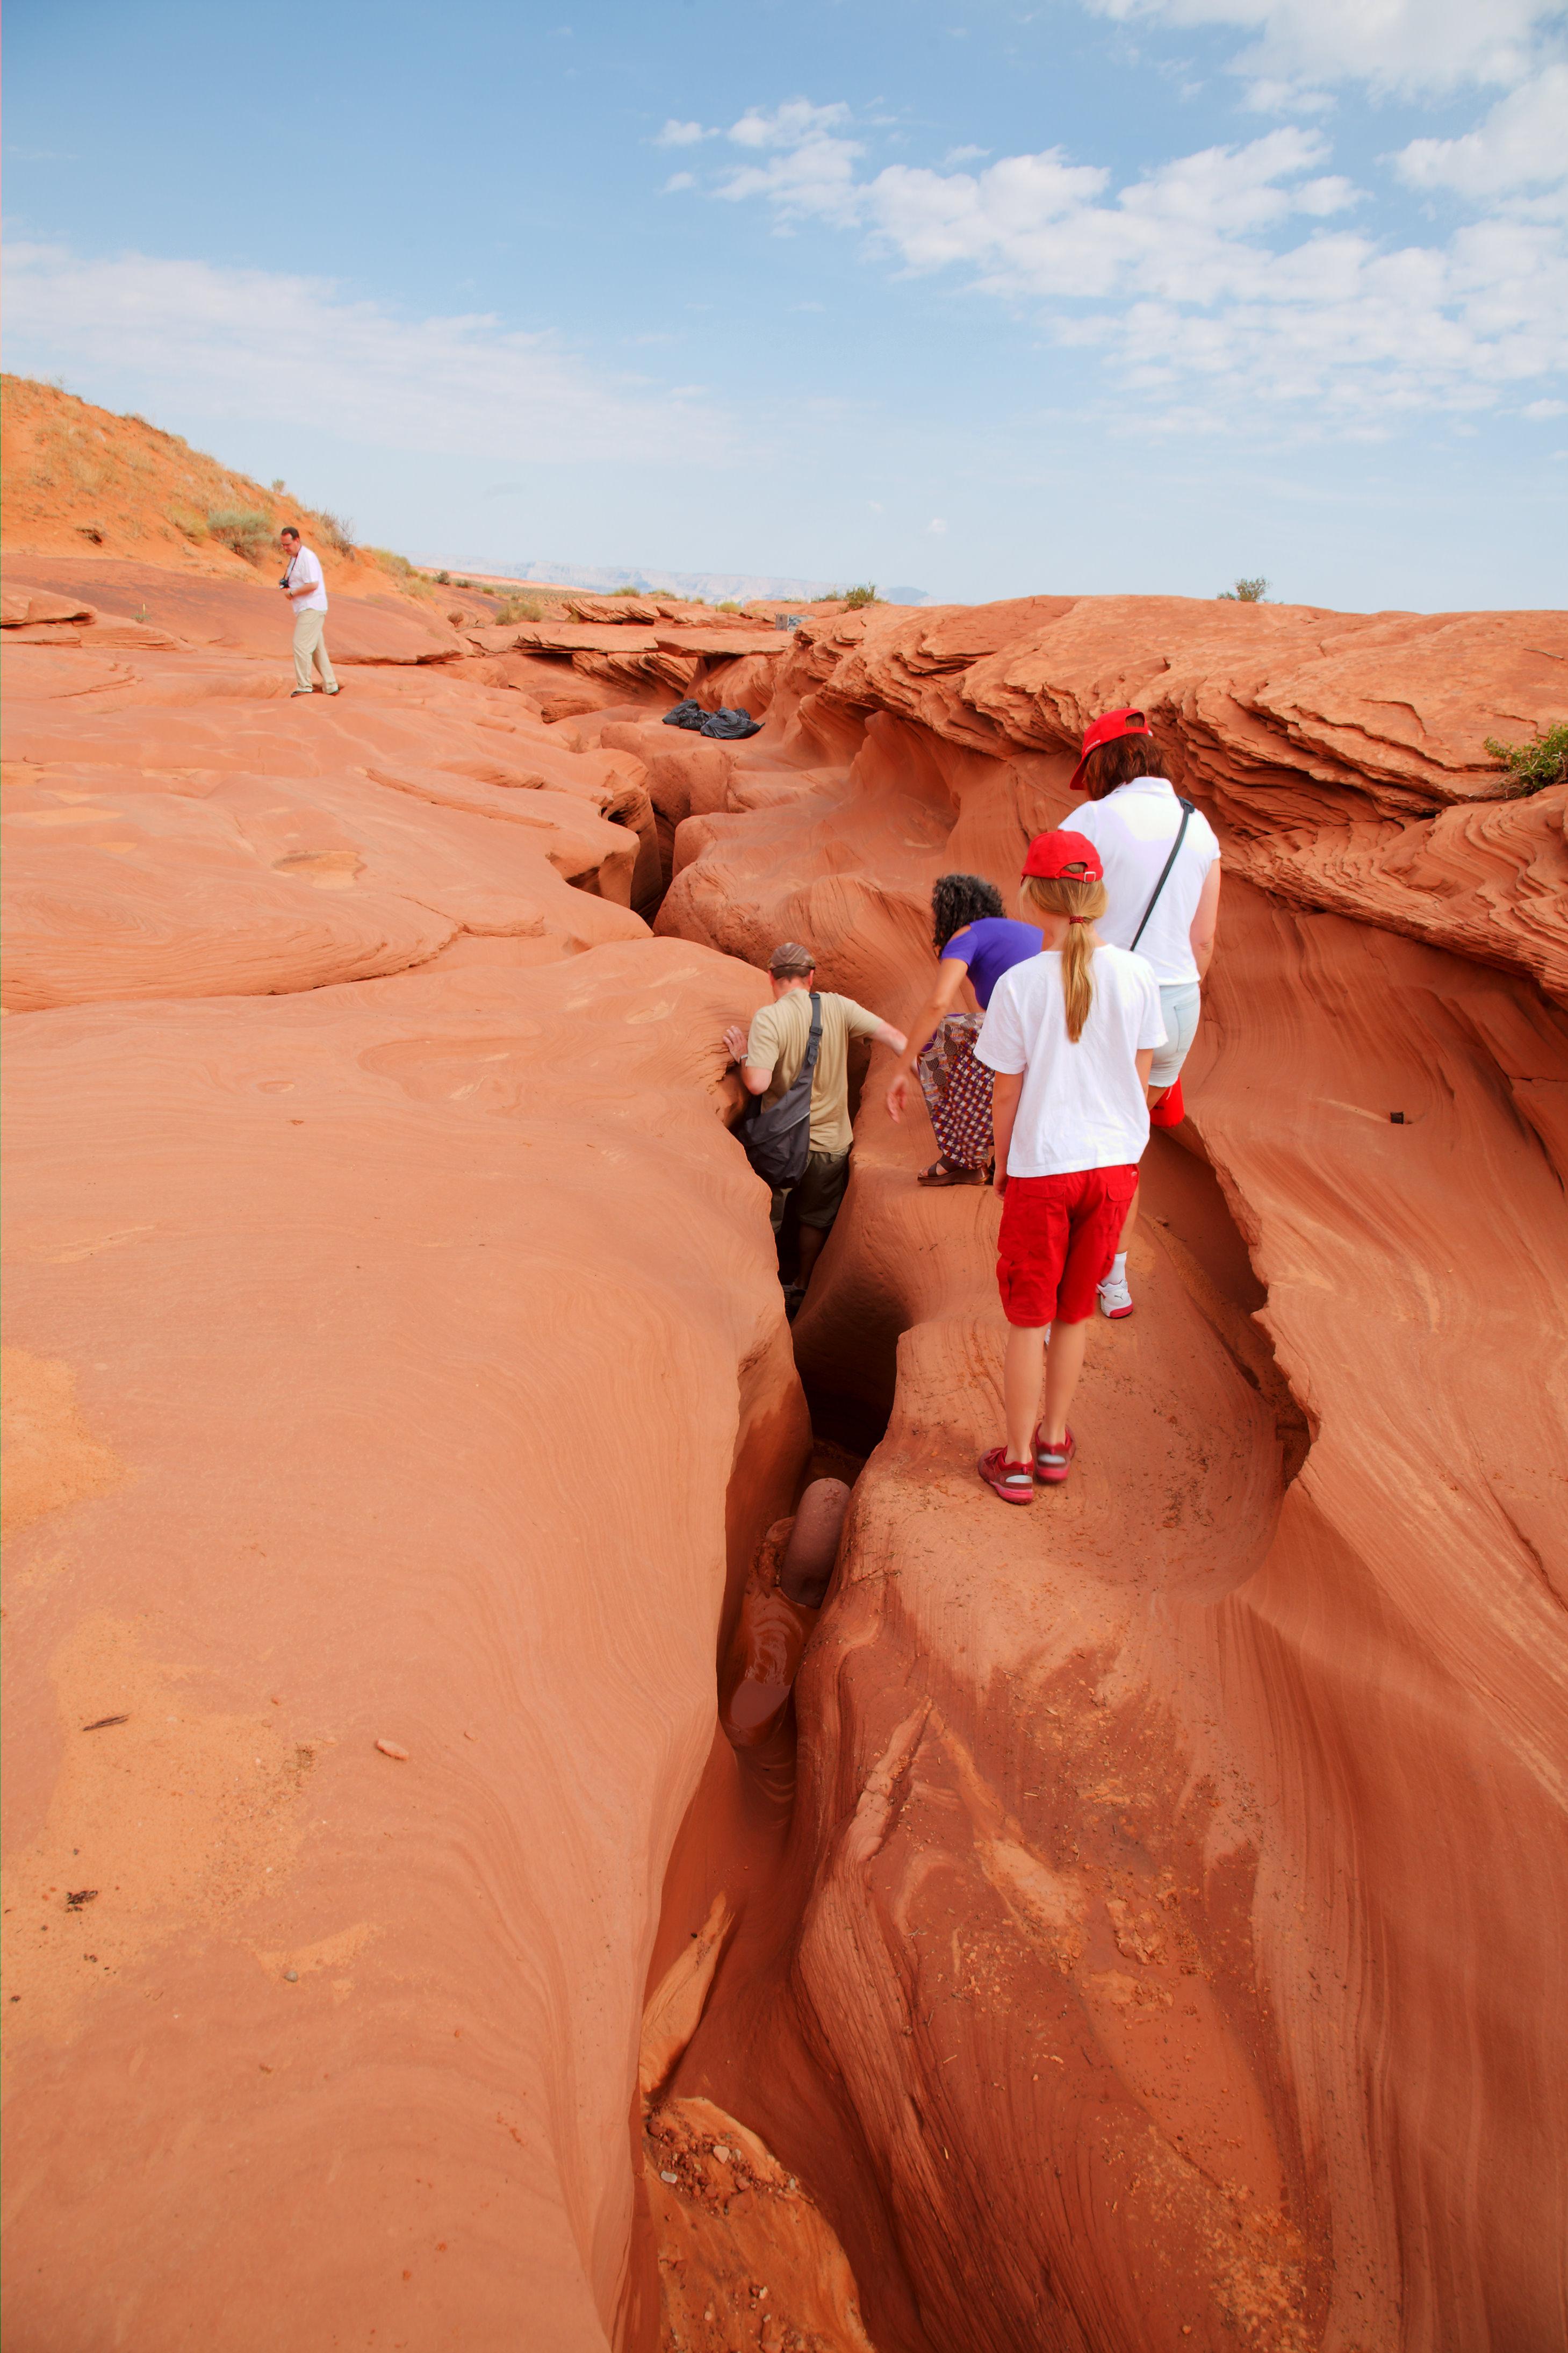 File:Lower Antelope Canyon entrance 01.jpg - Wikipedia